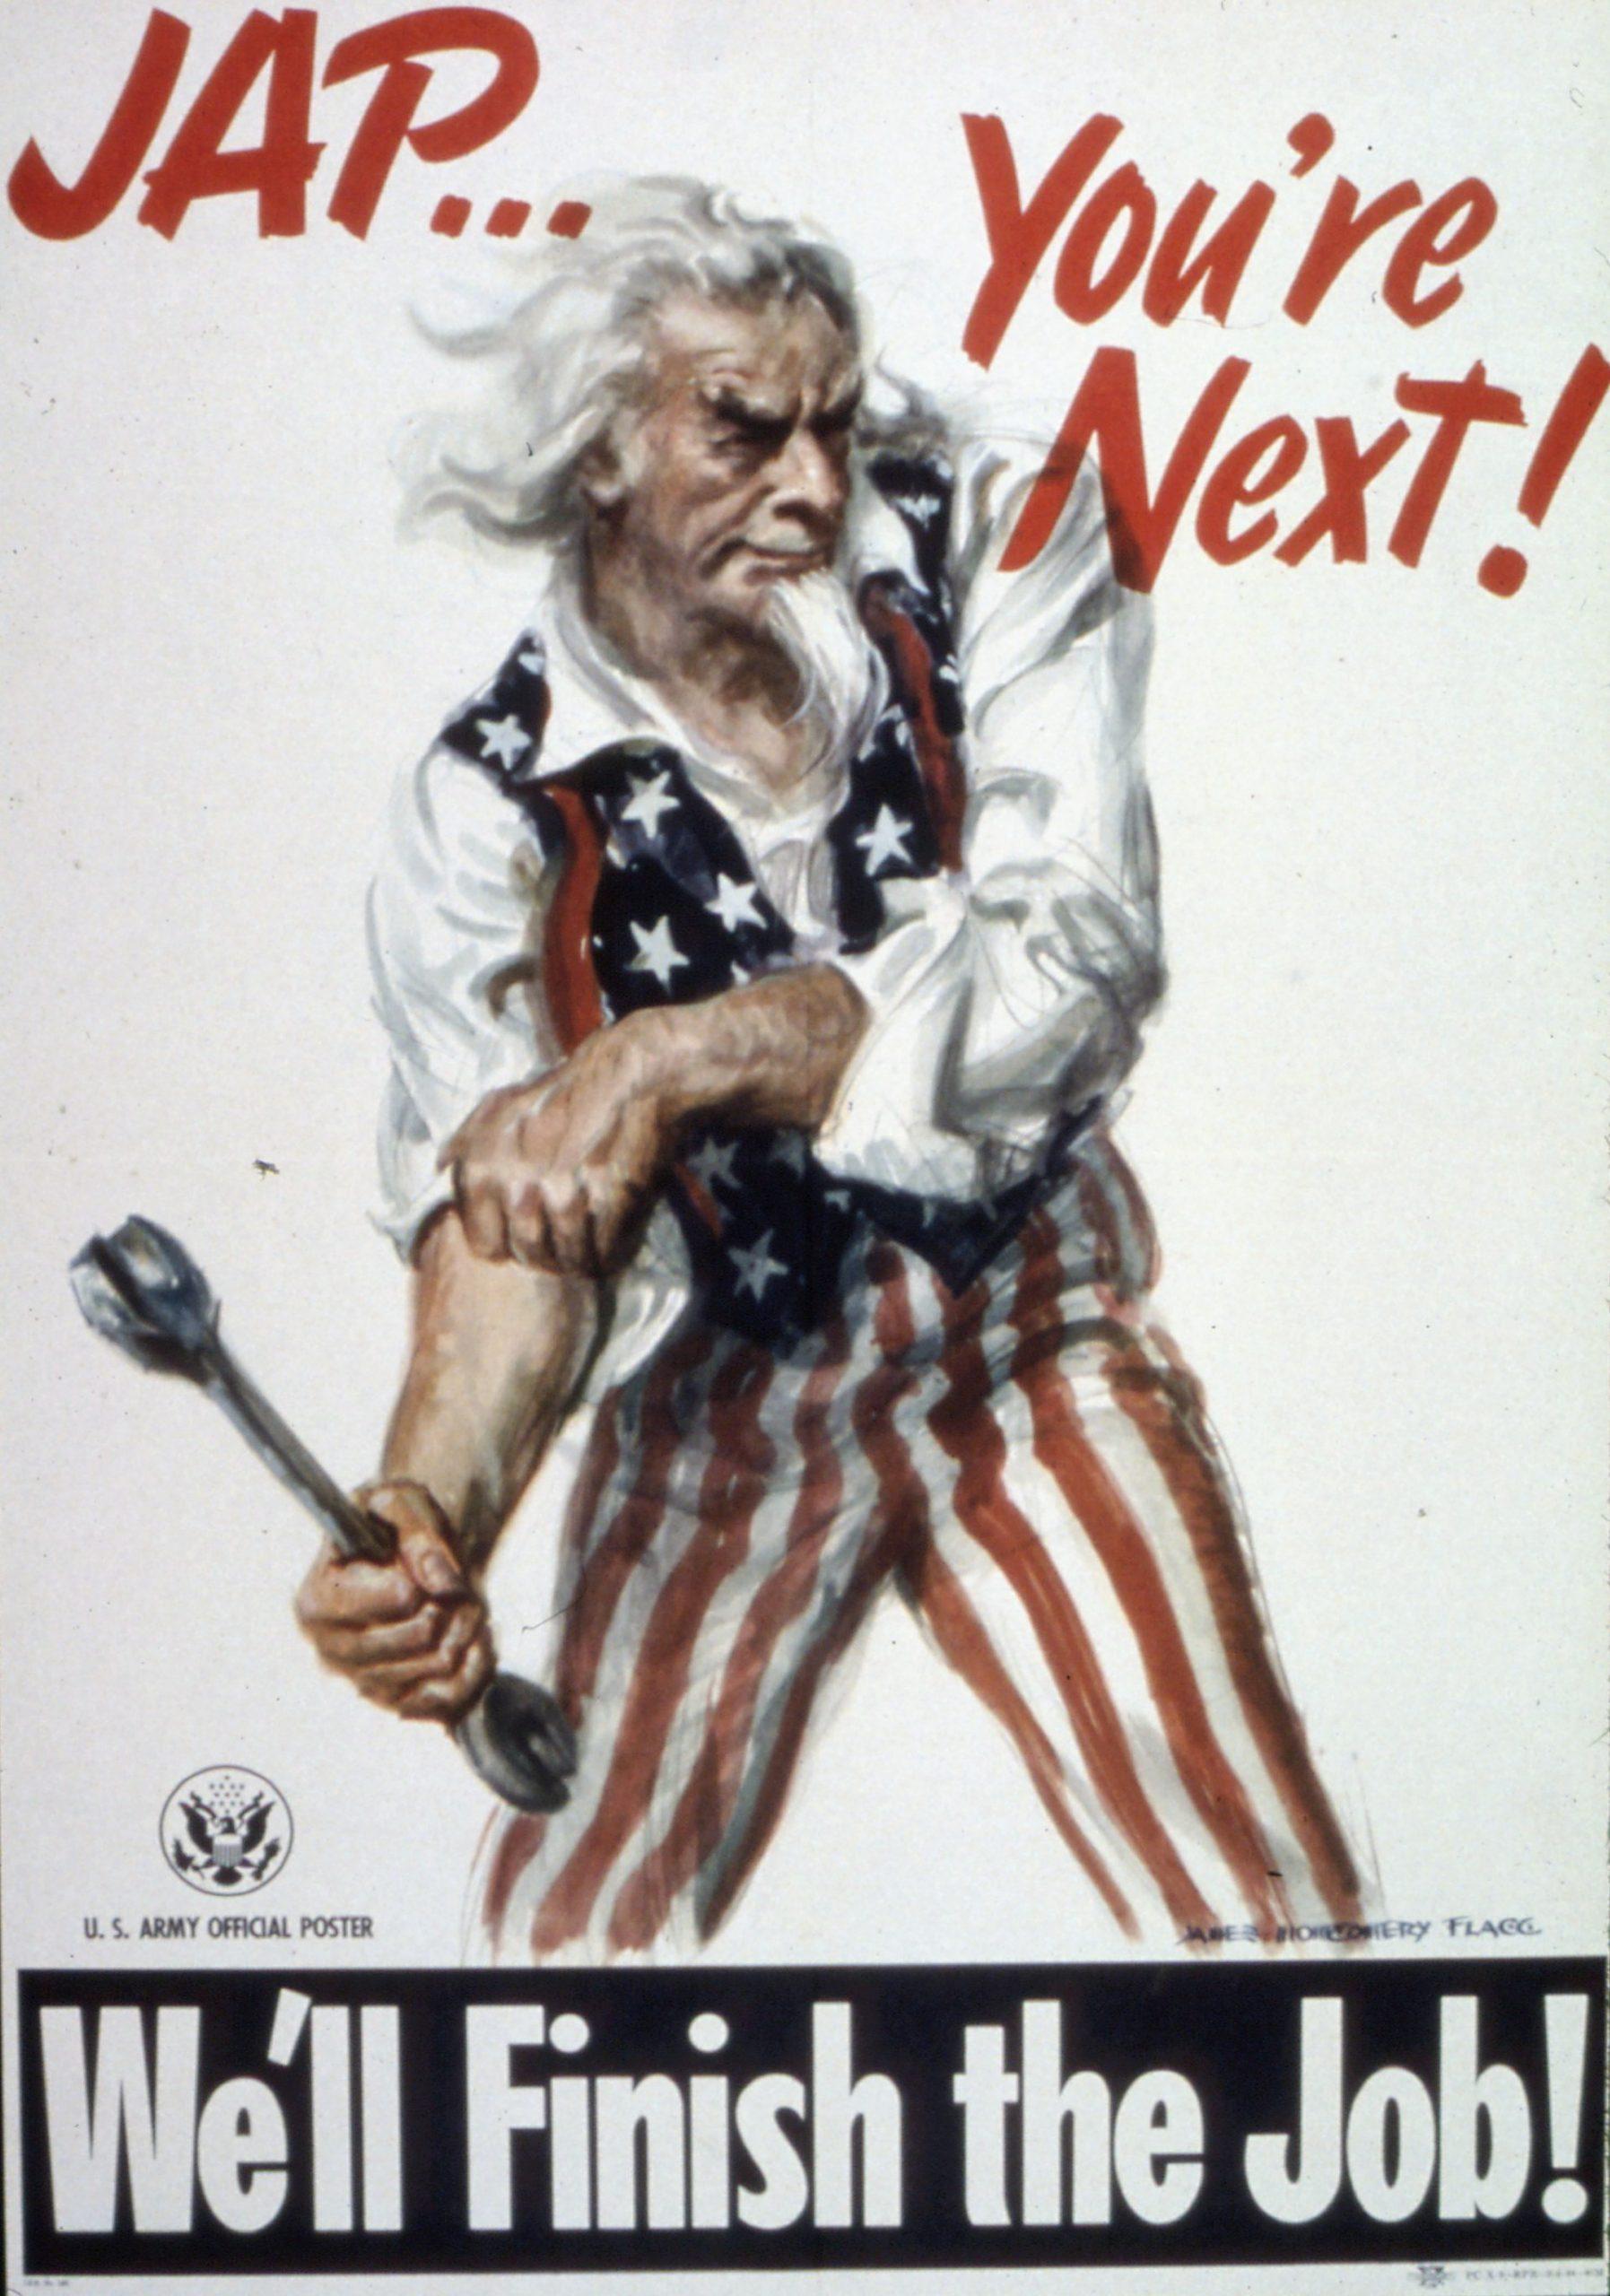 U.S. Army propaganda poster